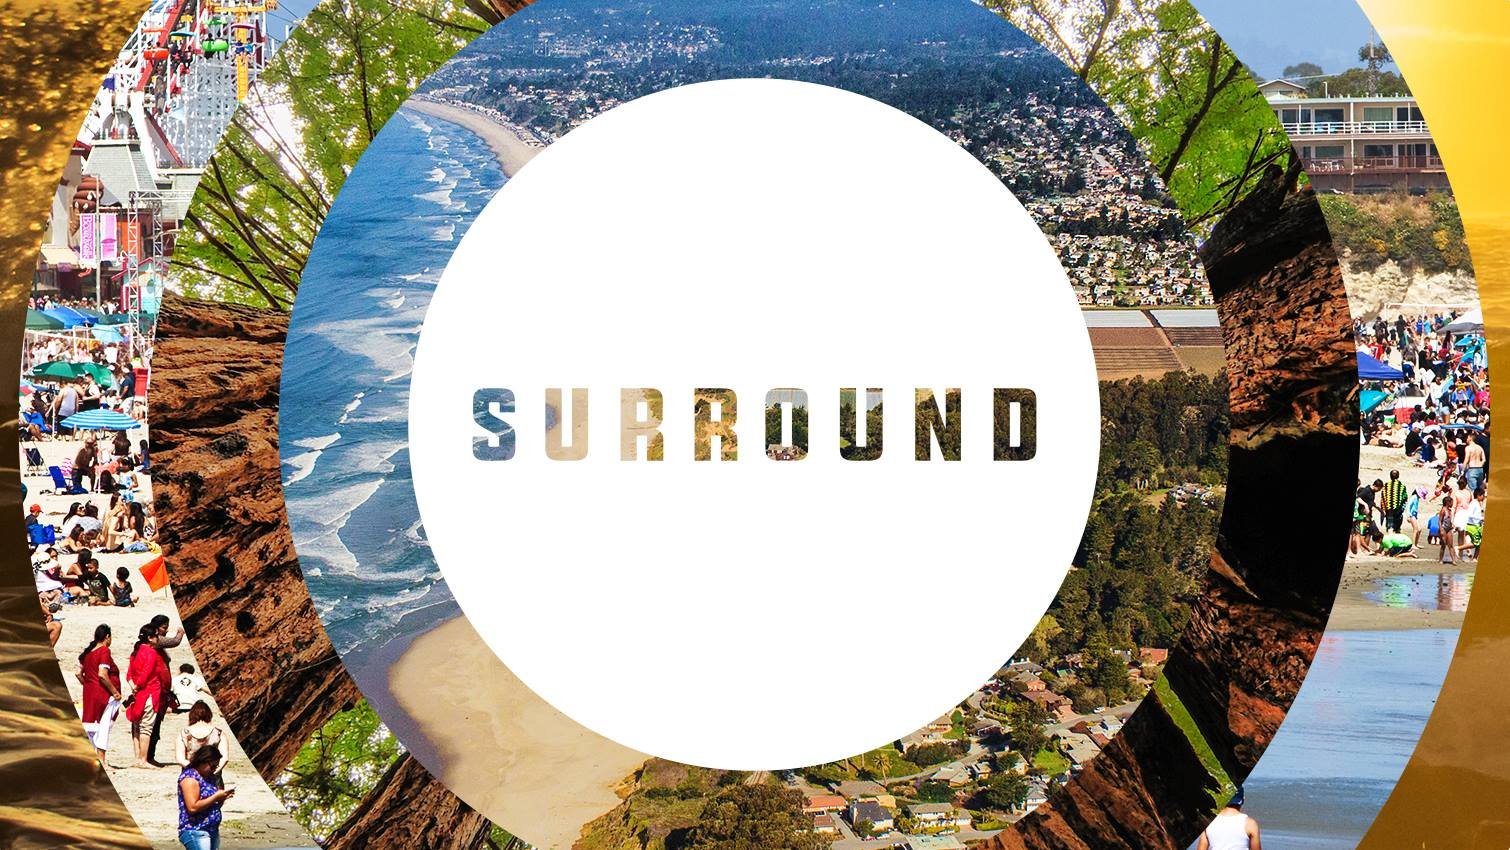 Surround.jpg